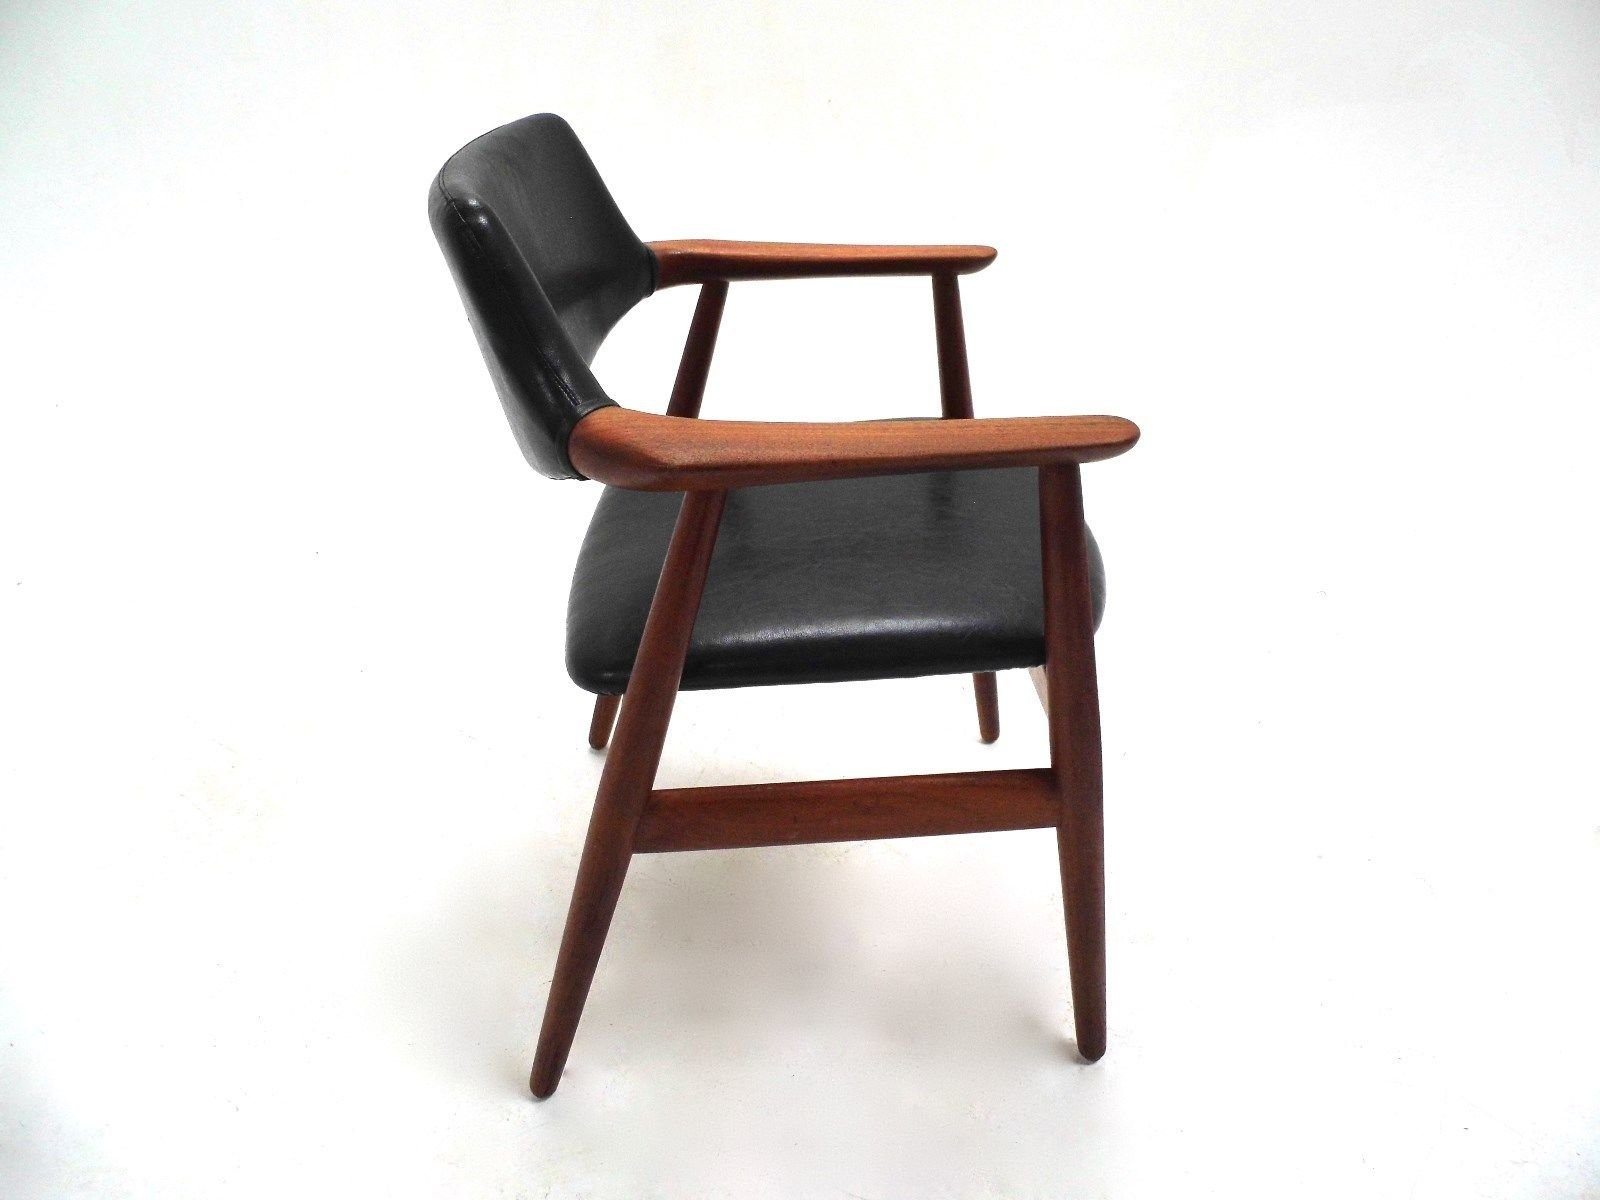 Danish Teak amp Black Vinyl Desk Armchair by Erik Kirkegaard  : danish teak black vinyl desk armchair by erik kirkegaard for glostrup mobelfabrik 1960s 10 from www.pamono.com size 1600 x 1200 jpeg 101kB